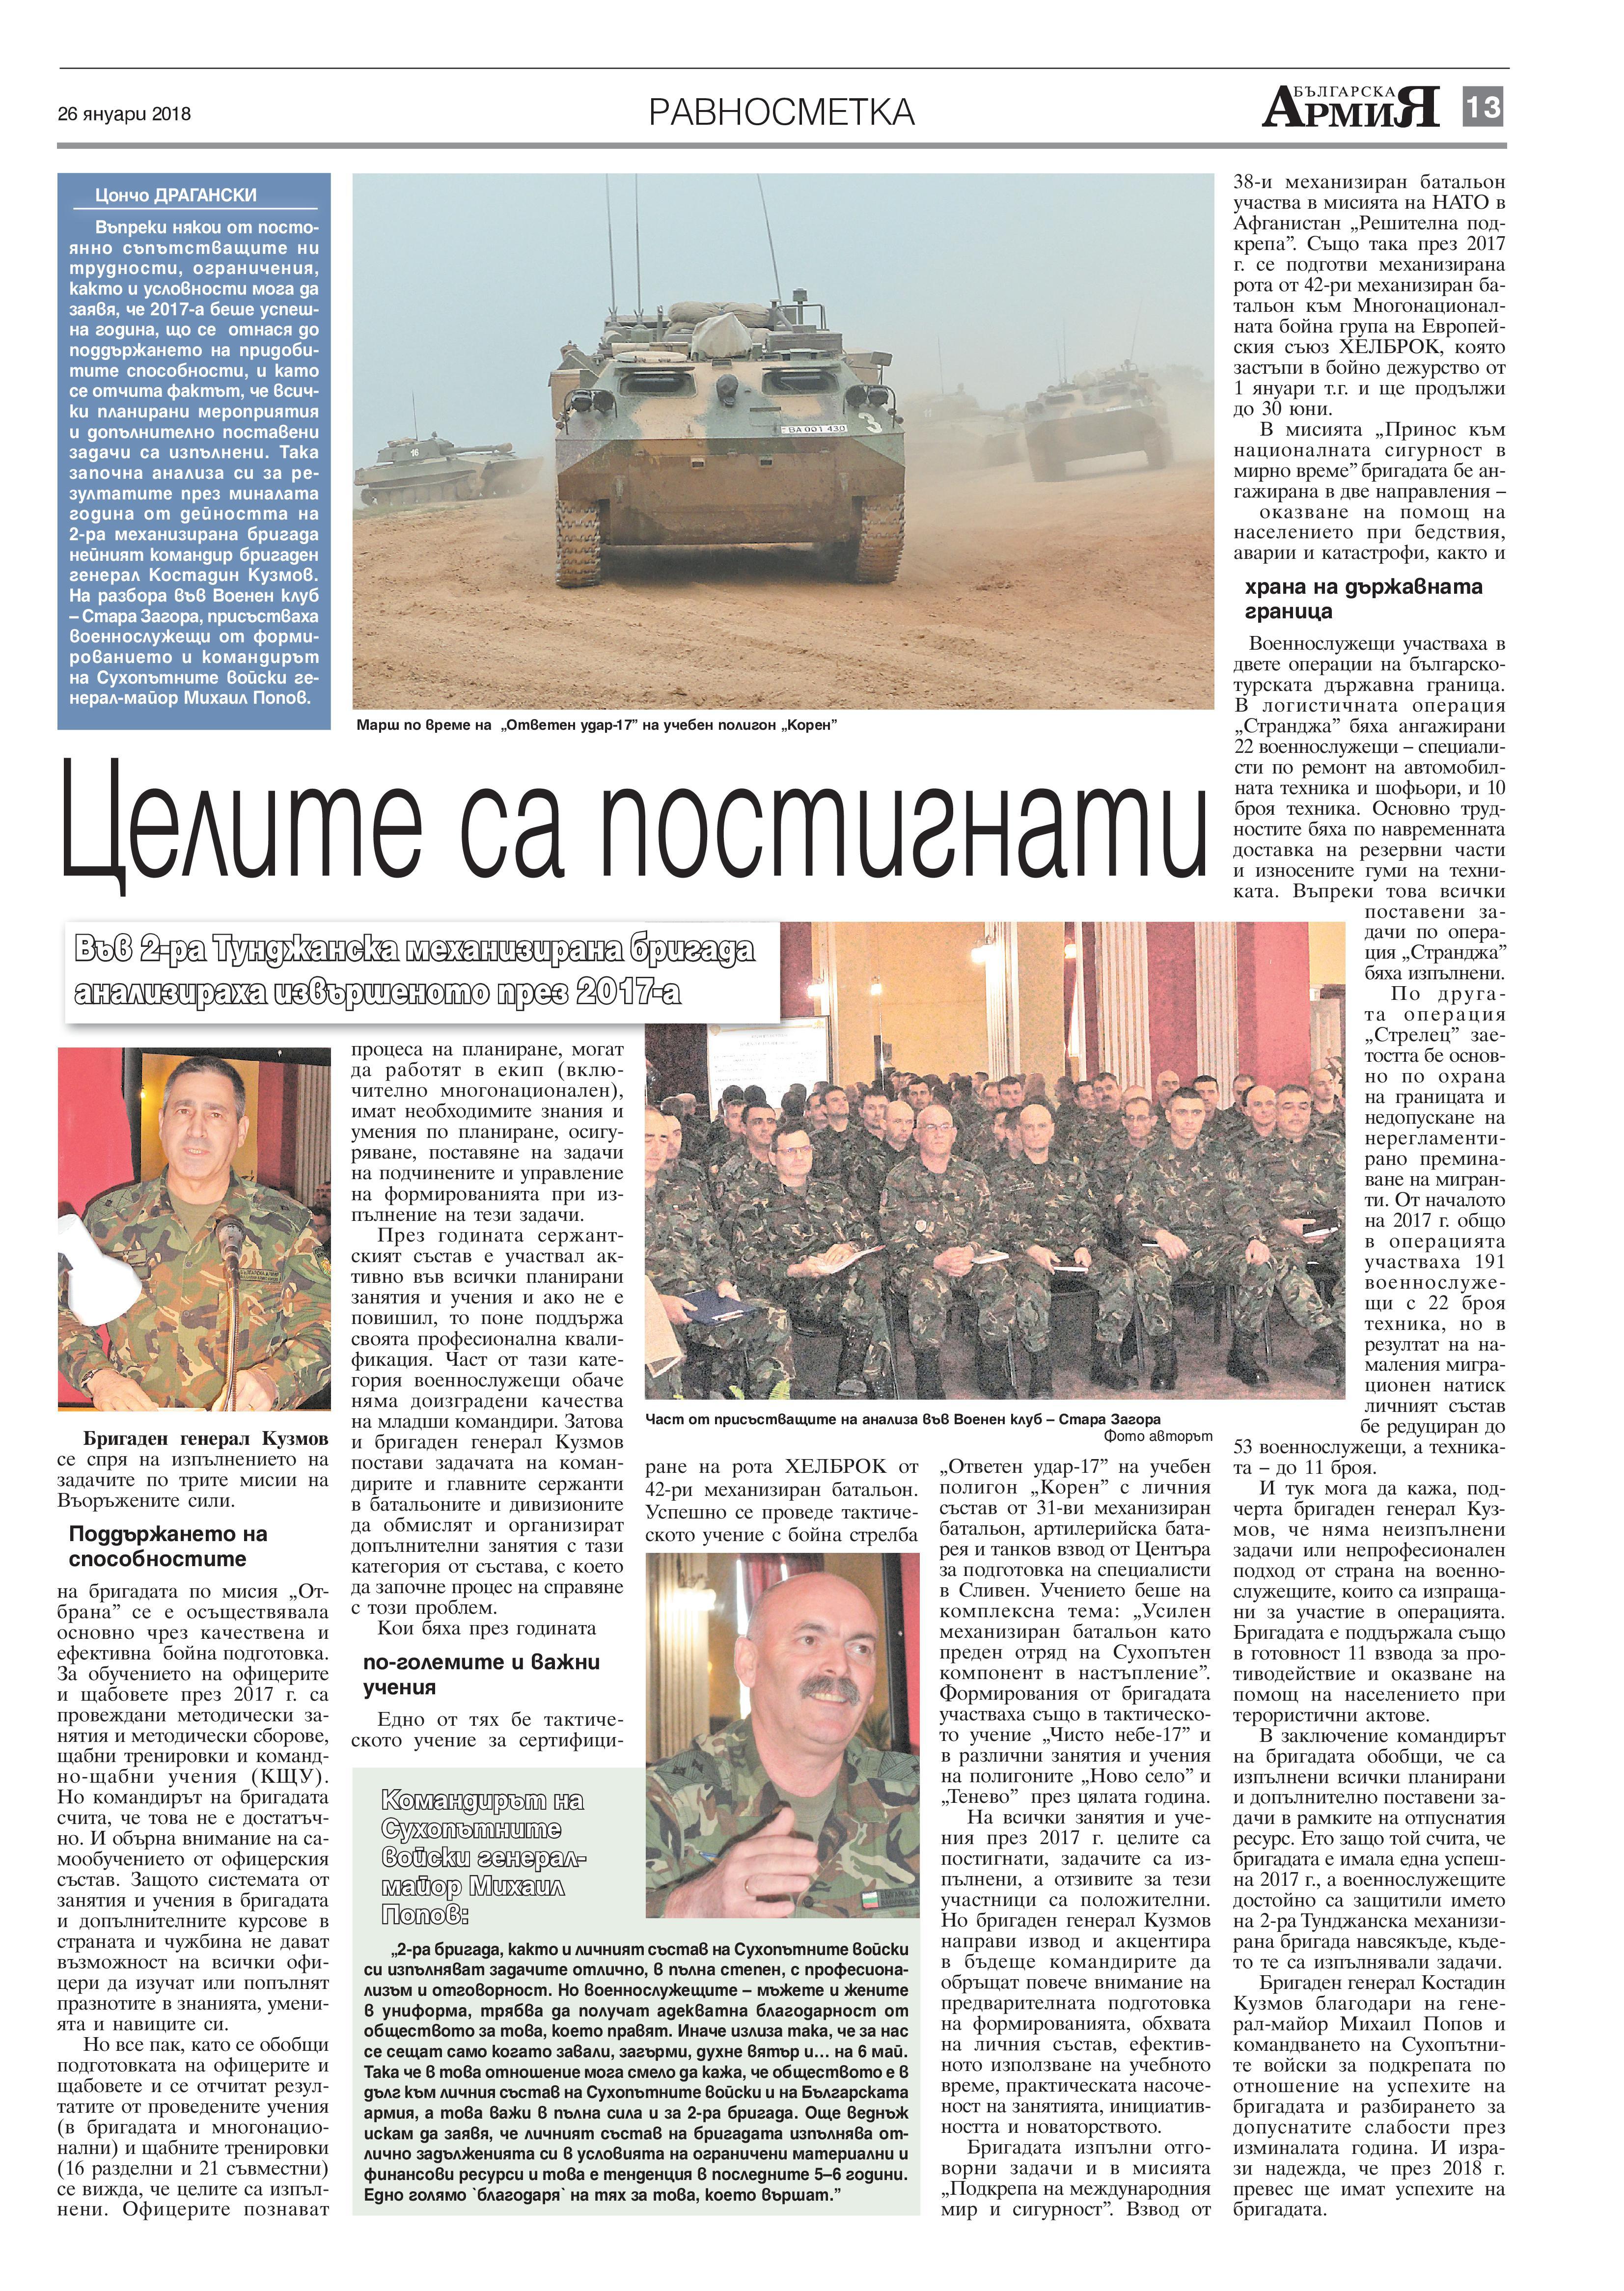 https://armymedia.bg/wp-content/uploads/2015/06/13-18.jpg